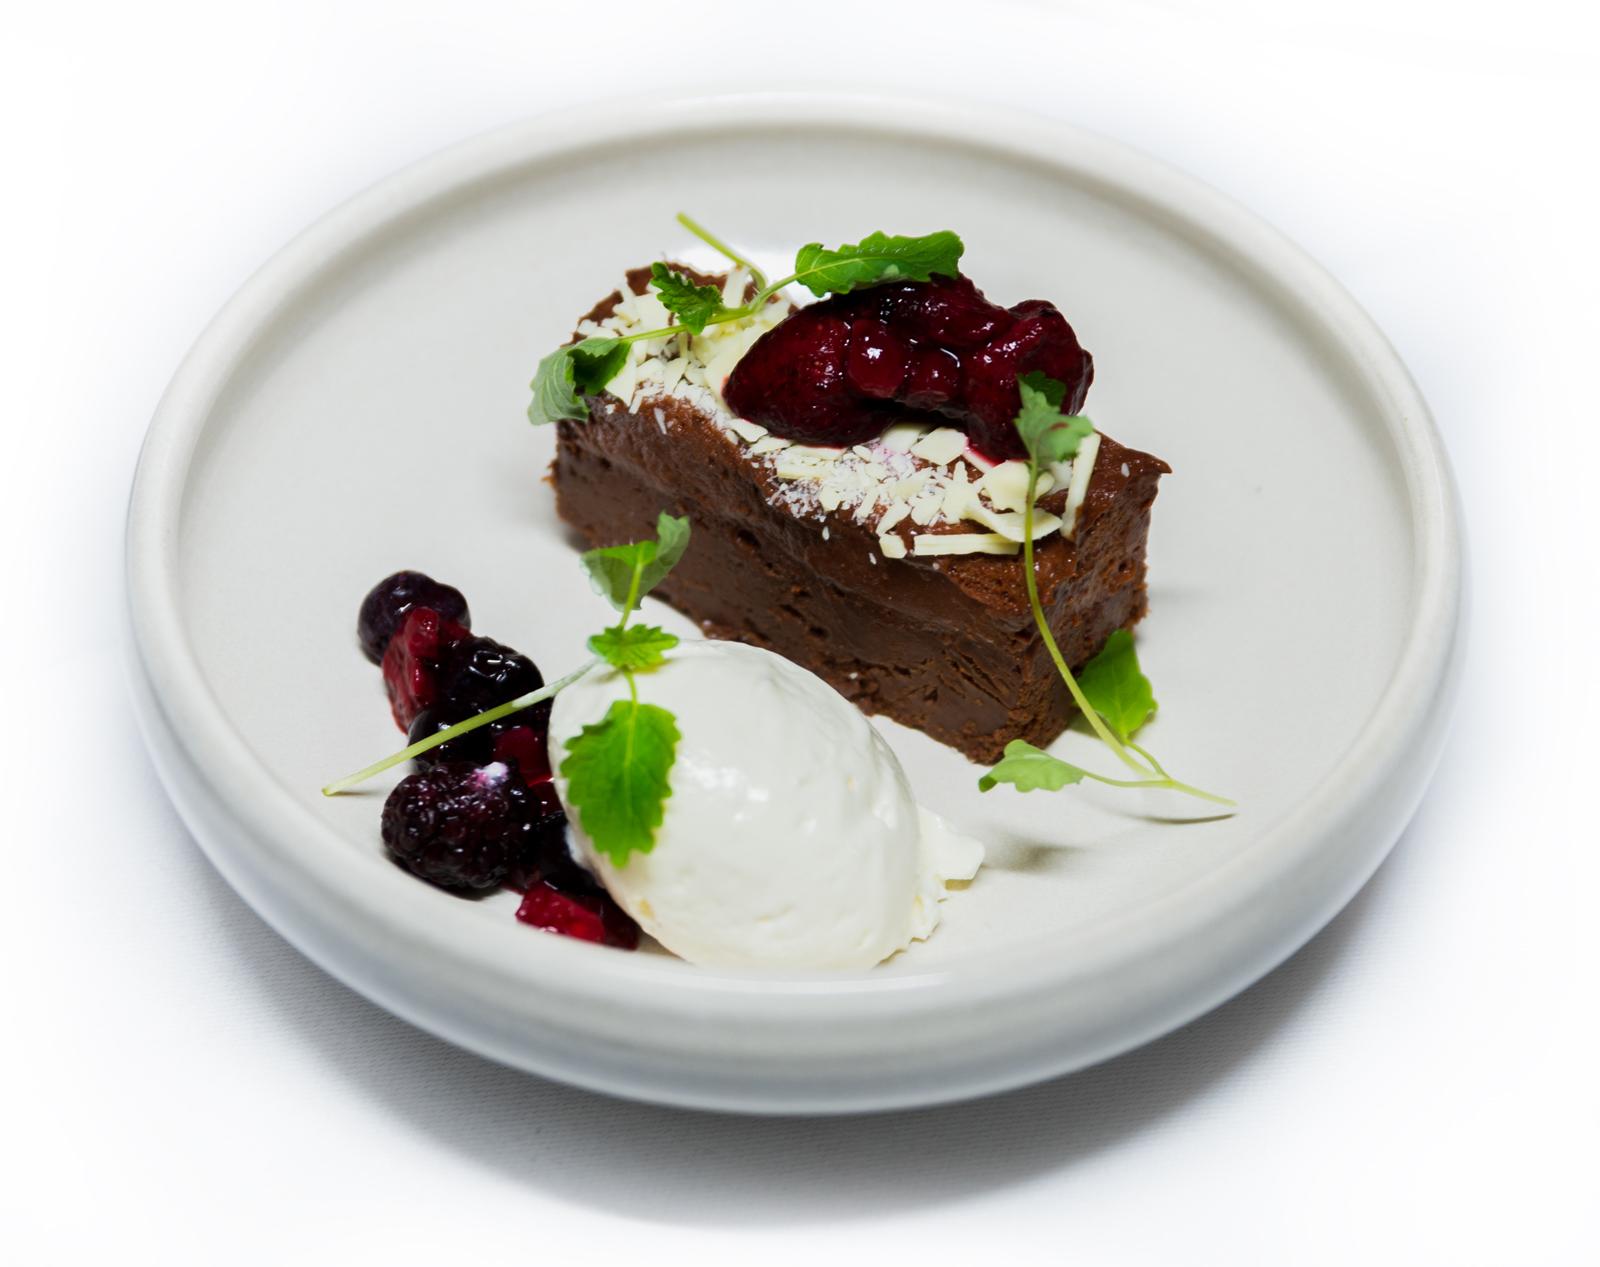 nytaarsmenu-dessert